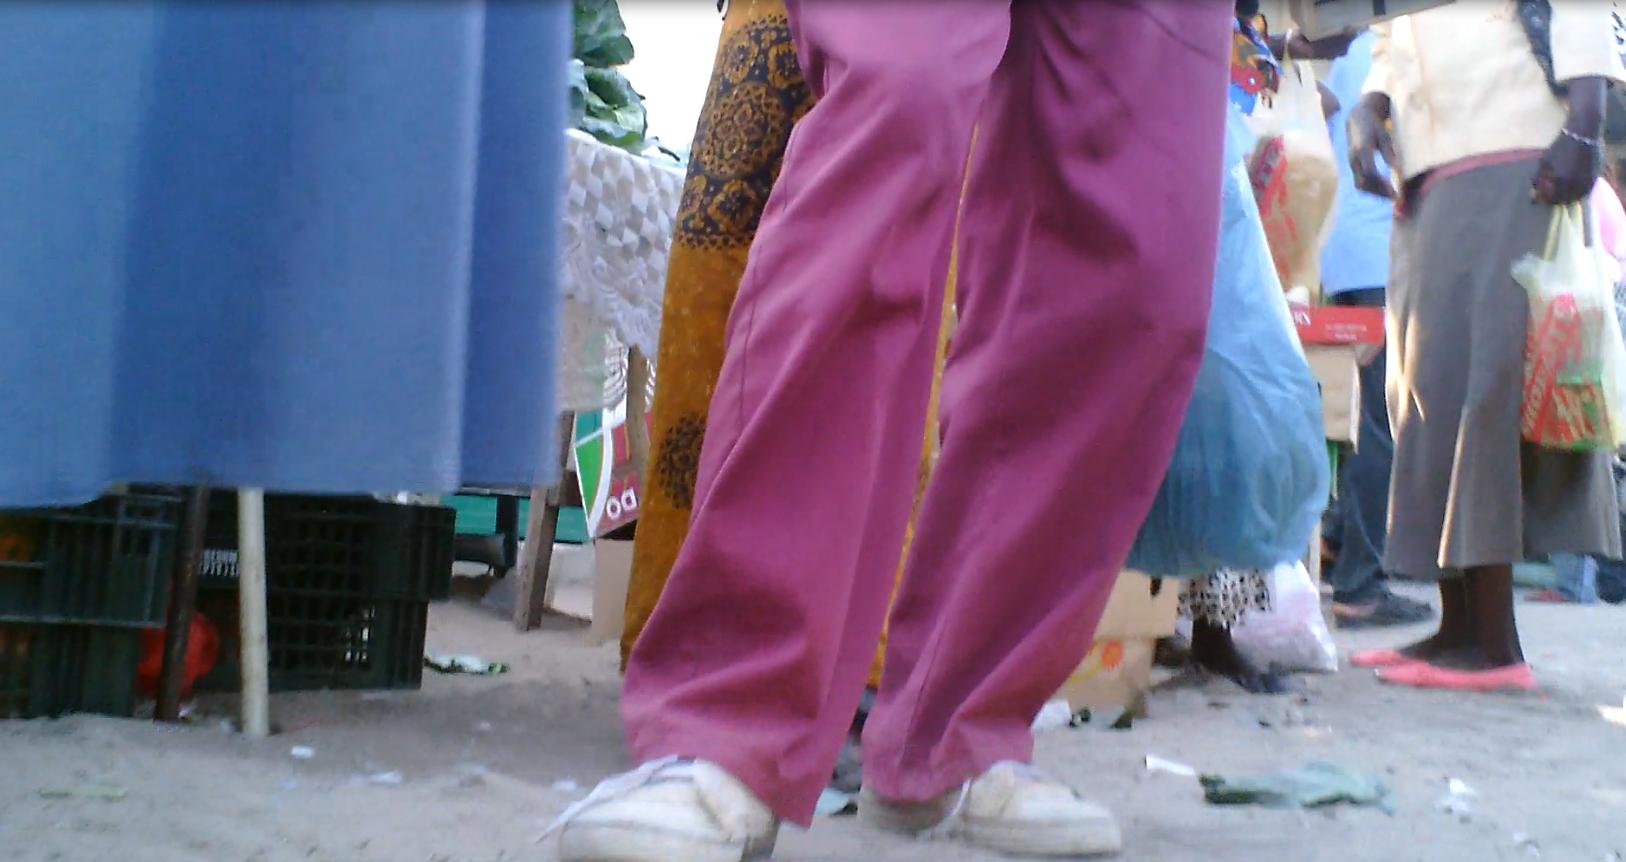 Feet-Pröpper-2013-4